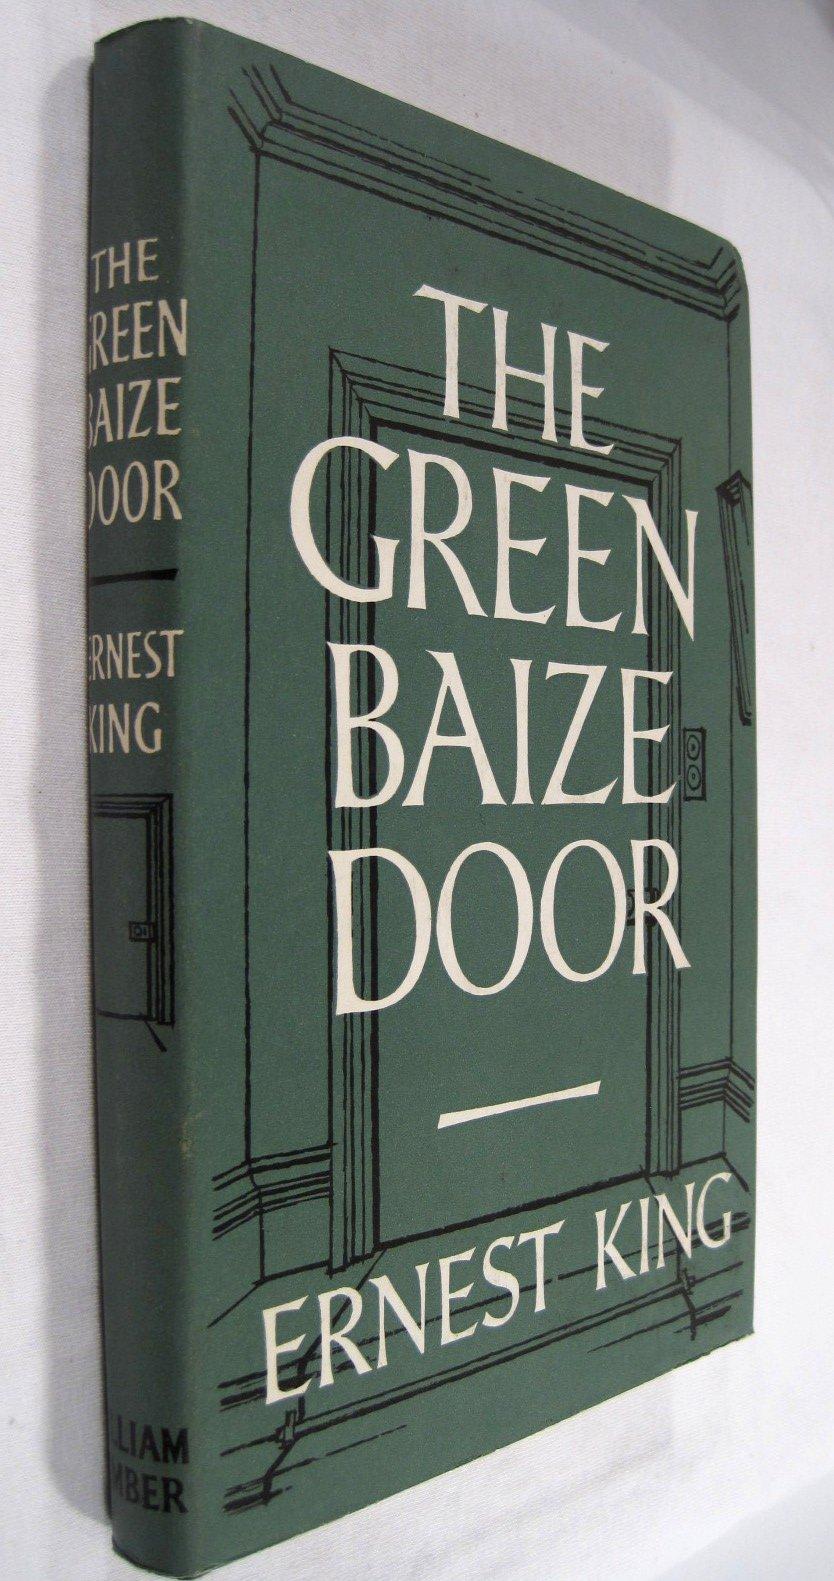 & The green baize door: Ernest King: Books - Amazon.ca